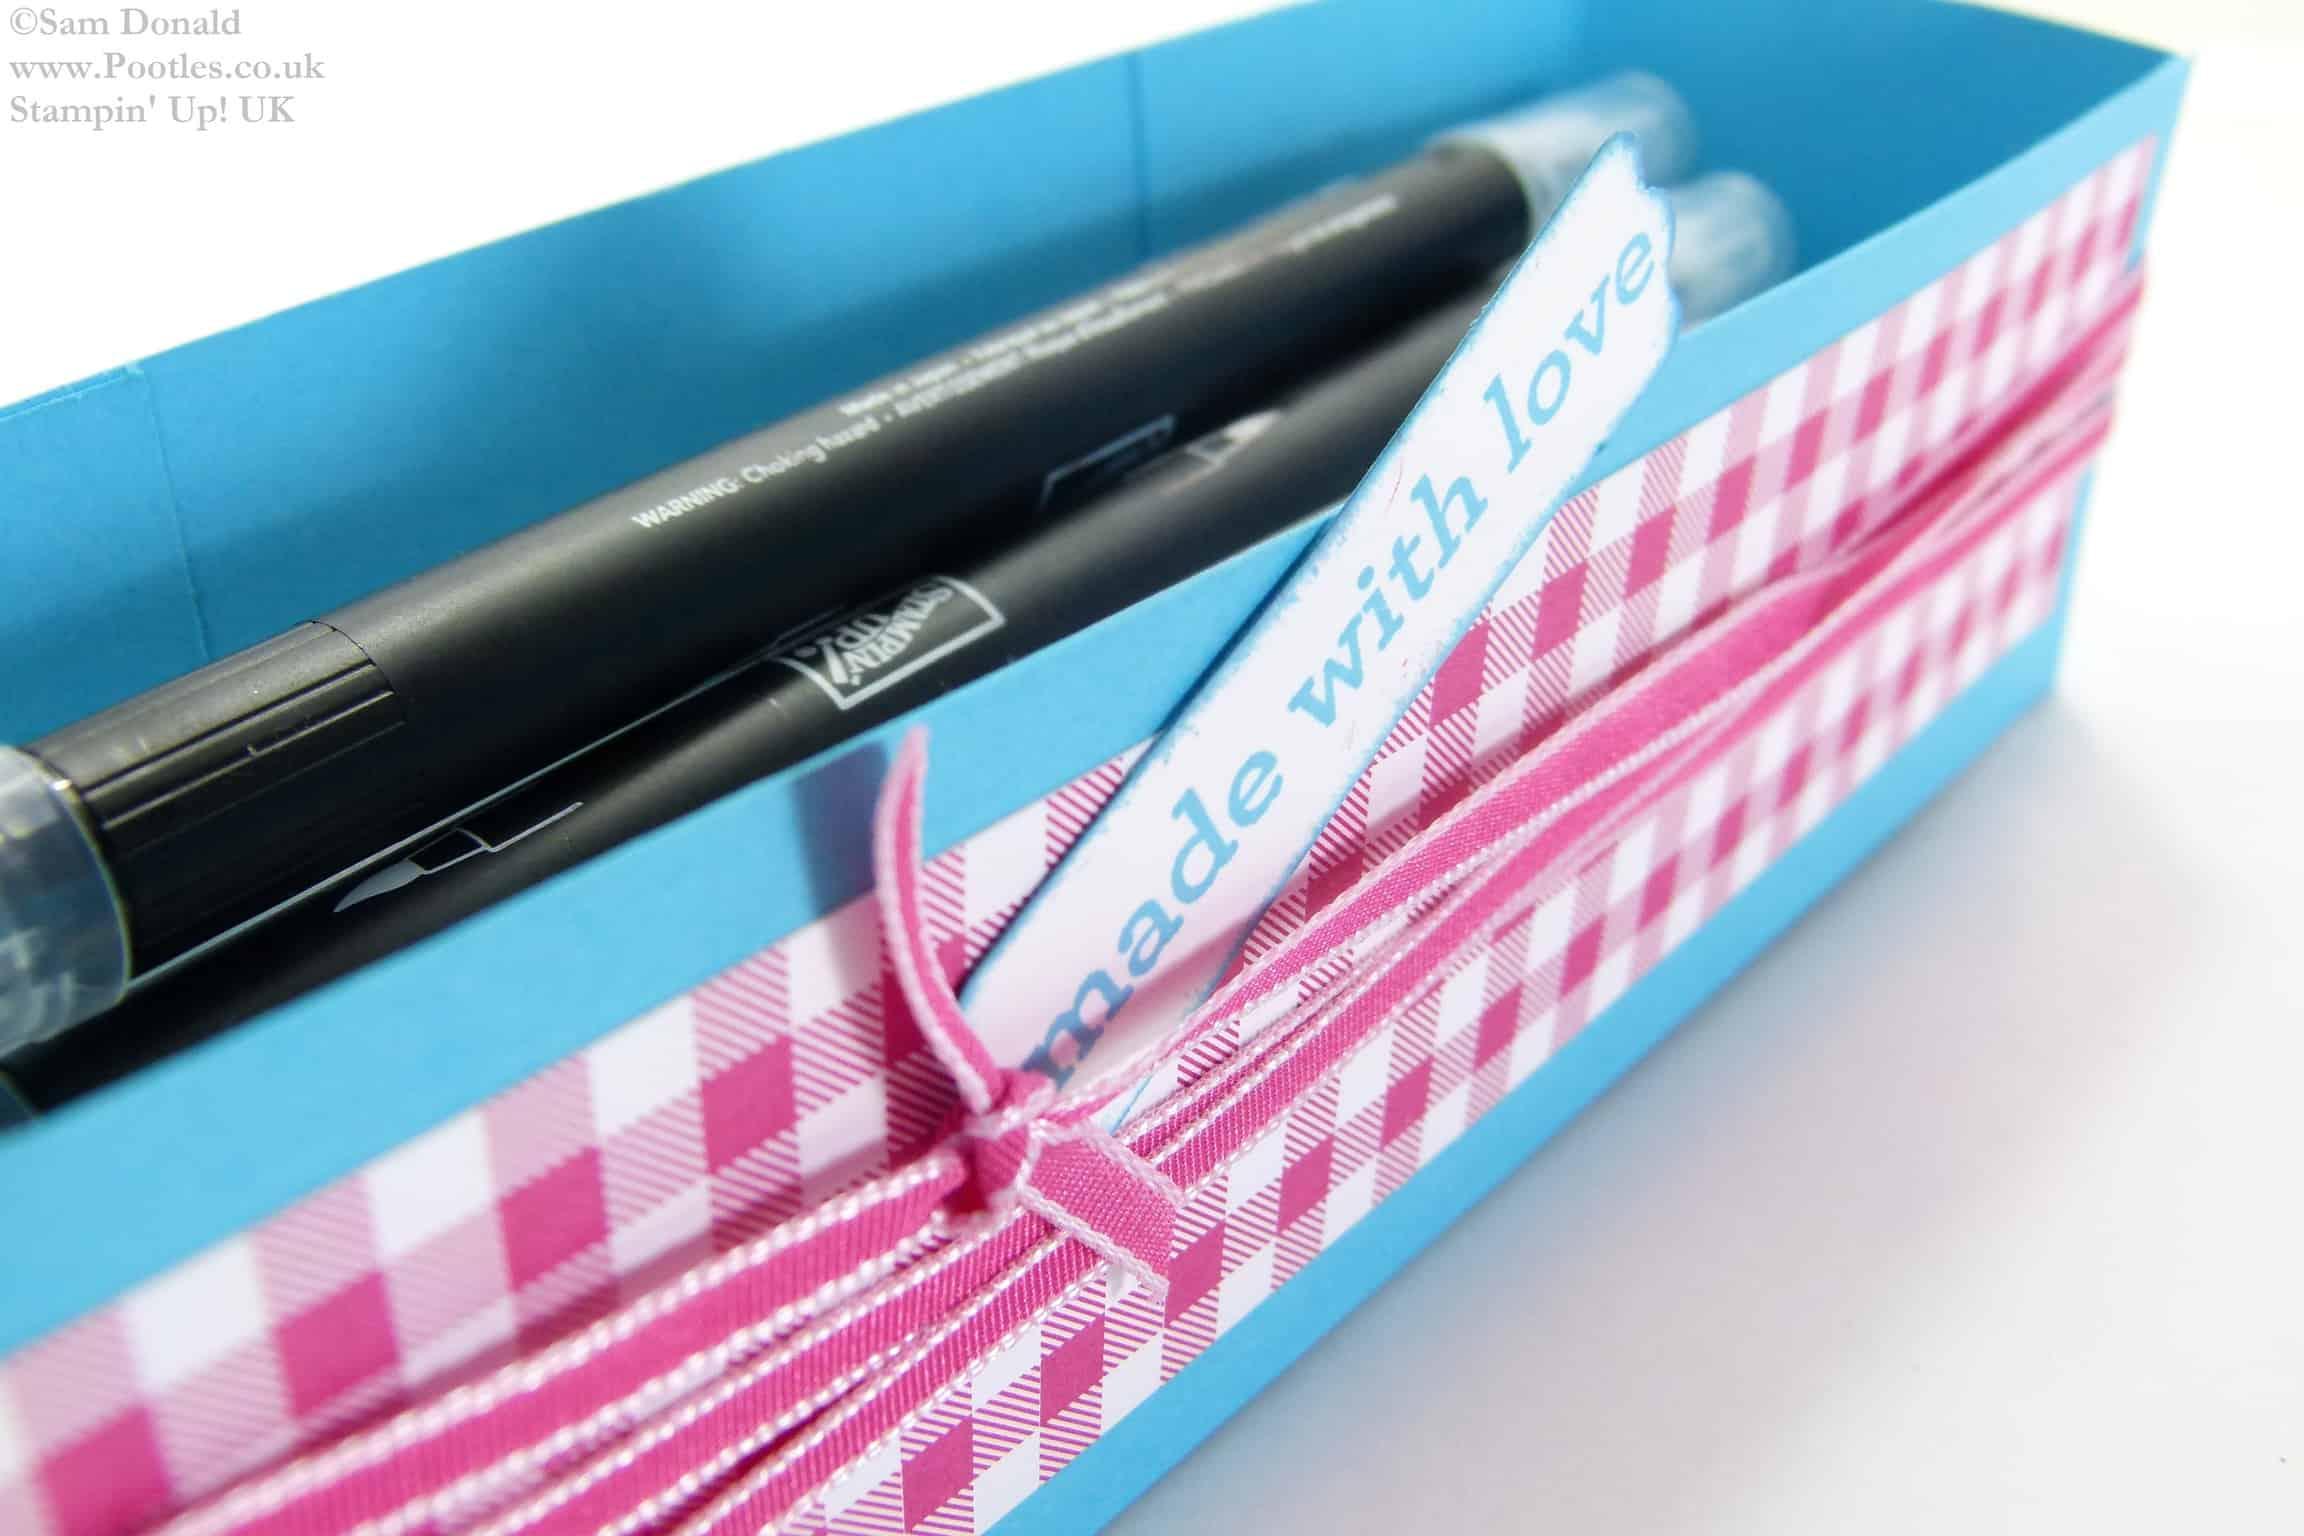 POOTLES Stampin Up UK Brights Week Pen Caddy Gift Box 2